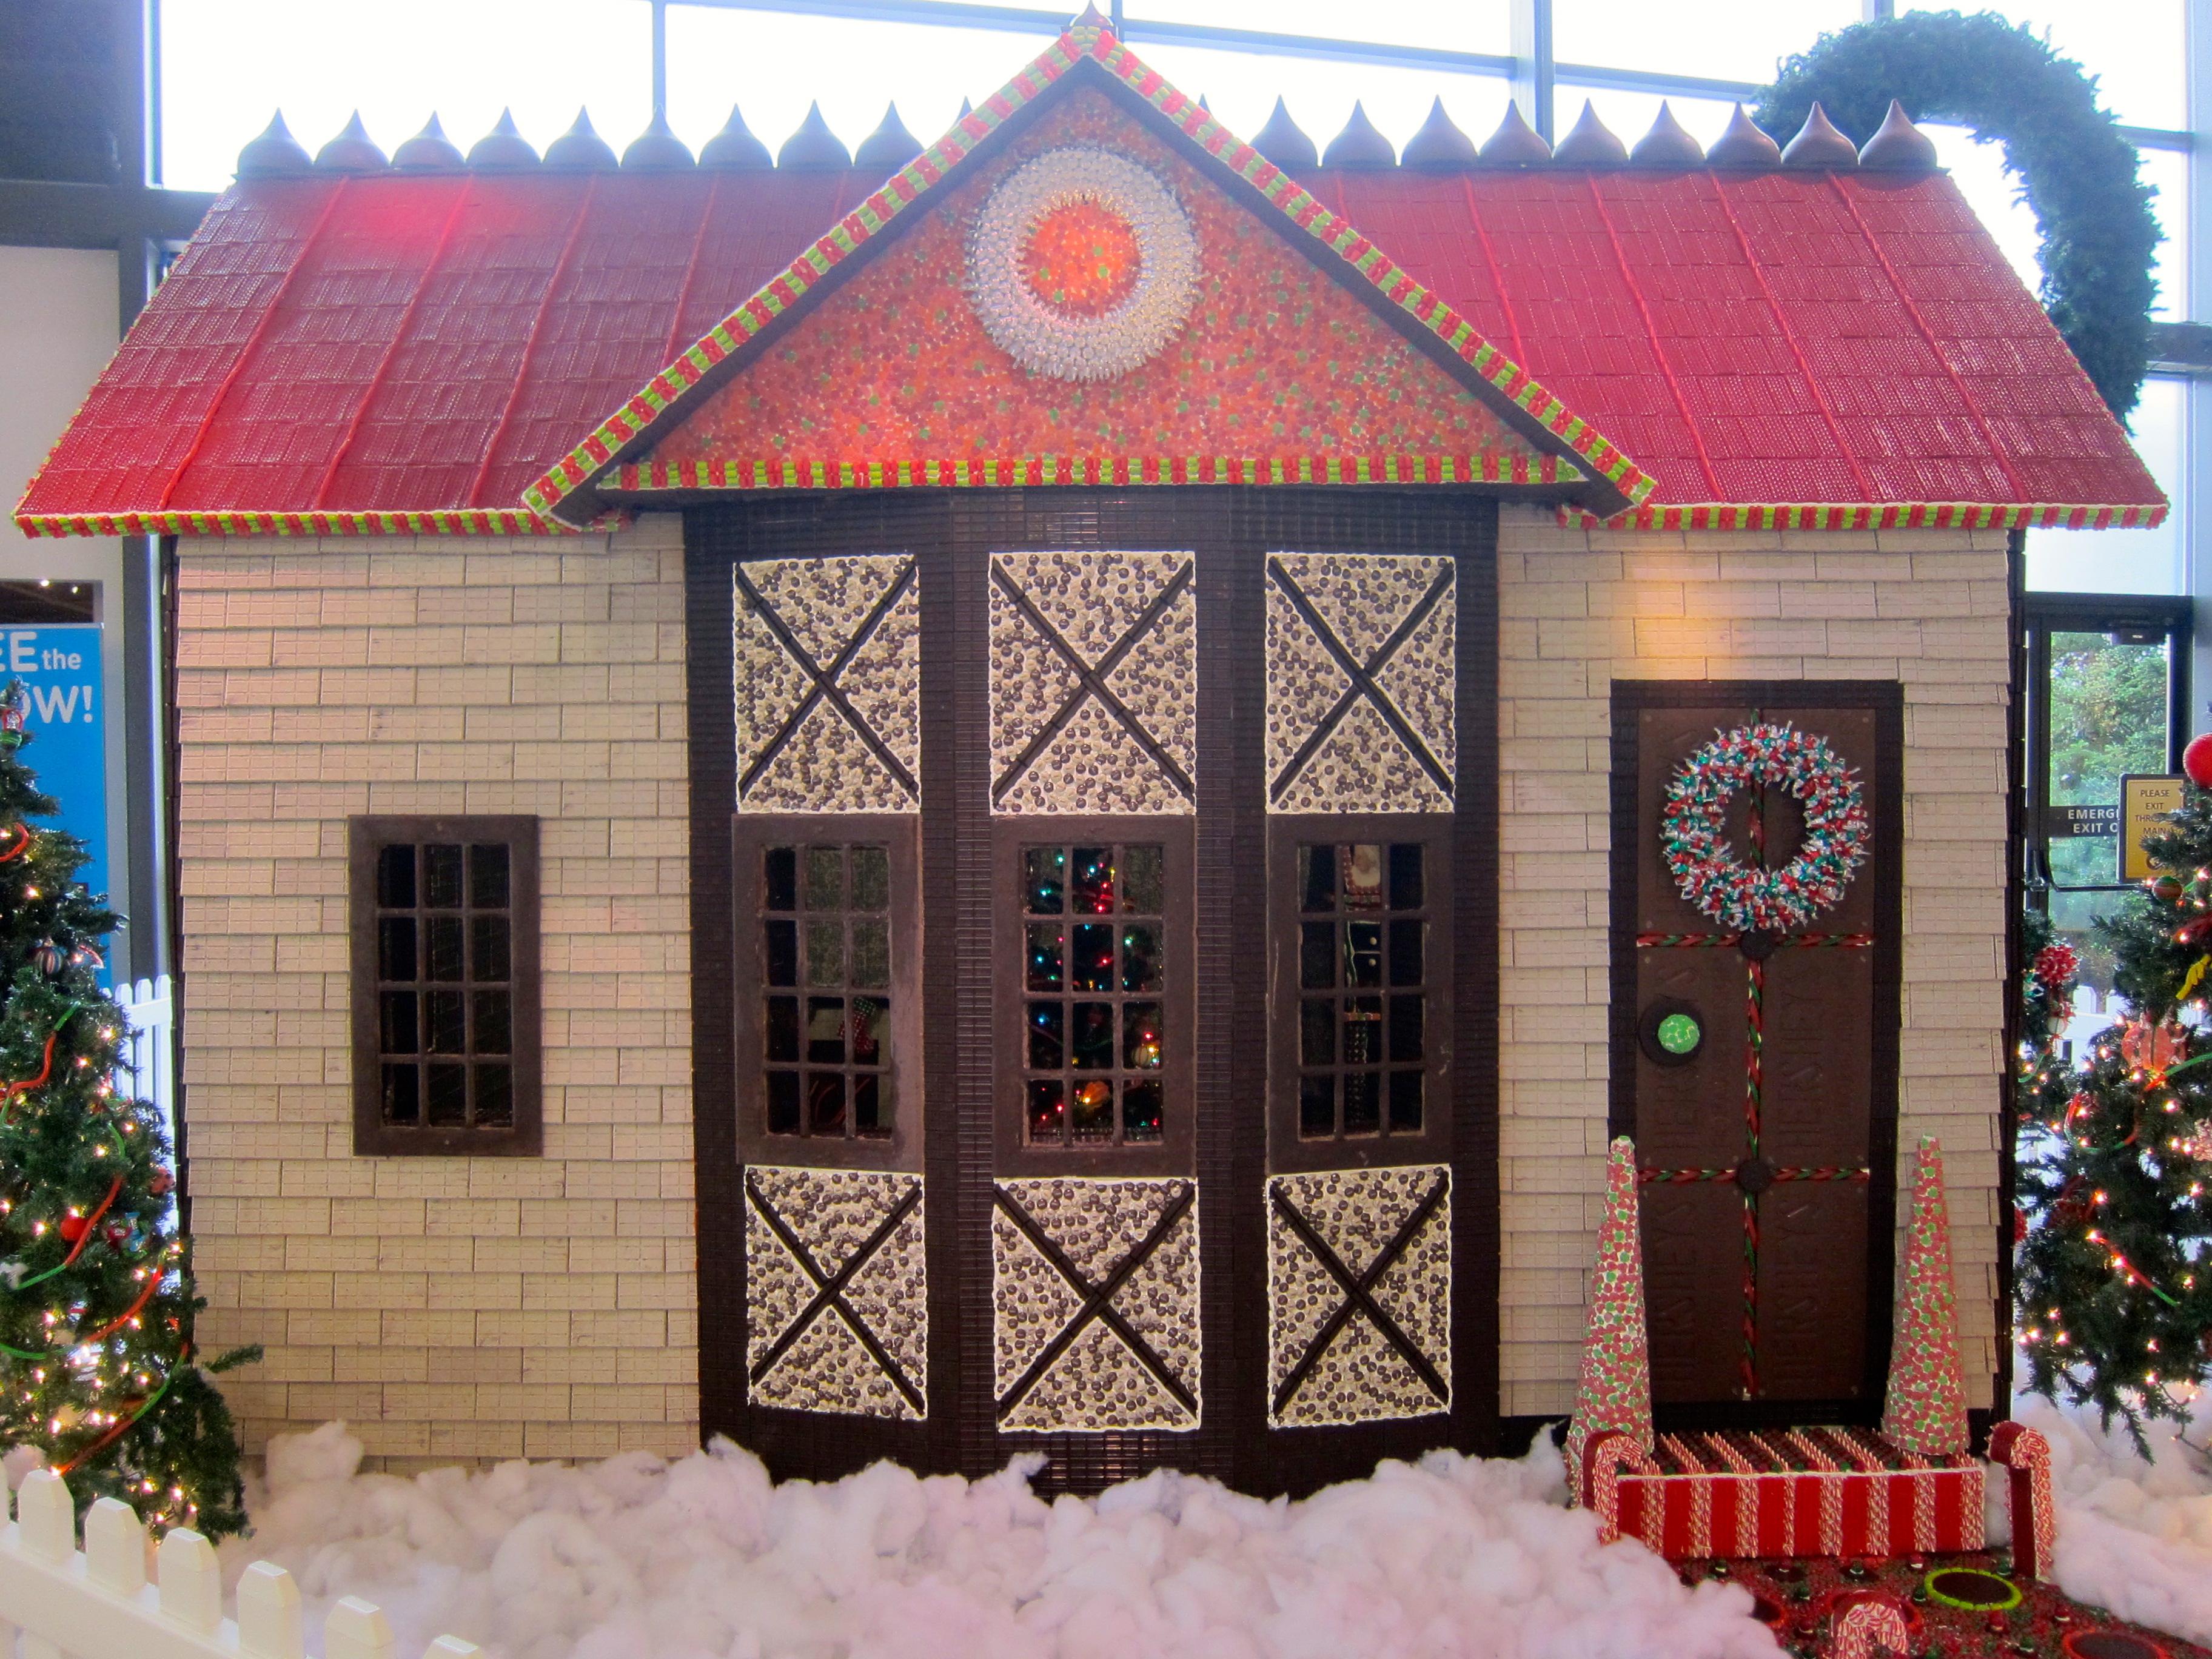 Hershey's Chocolate World Candy House | Secret Dad Society